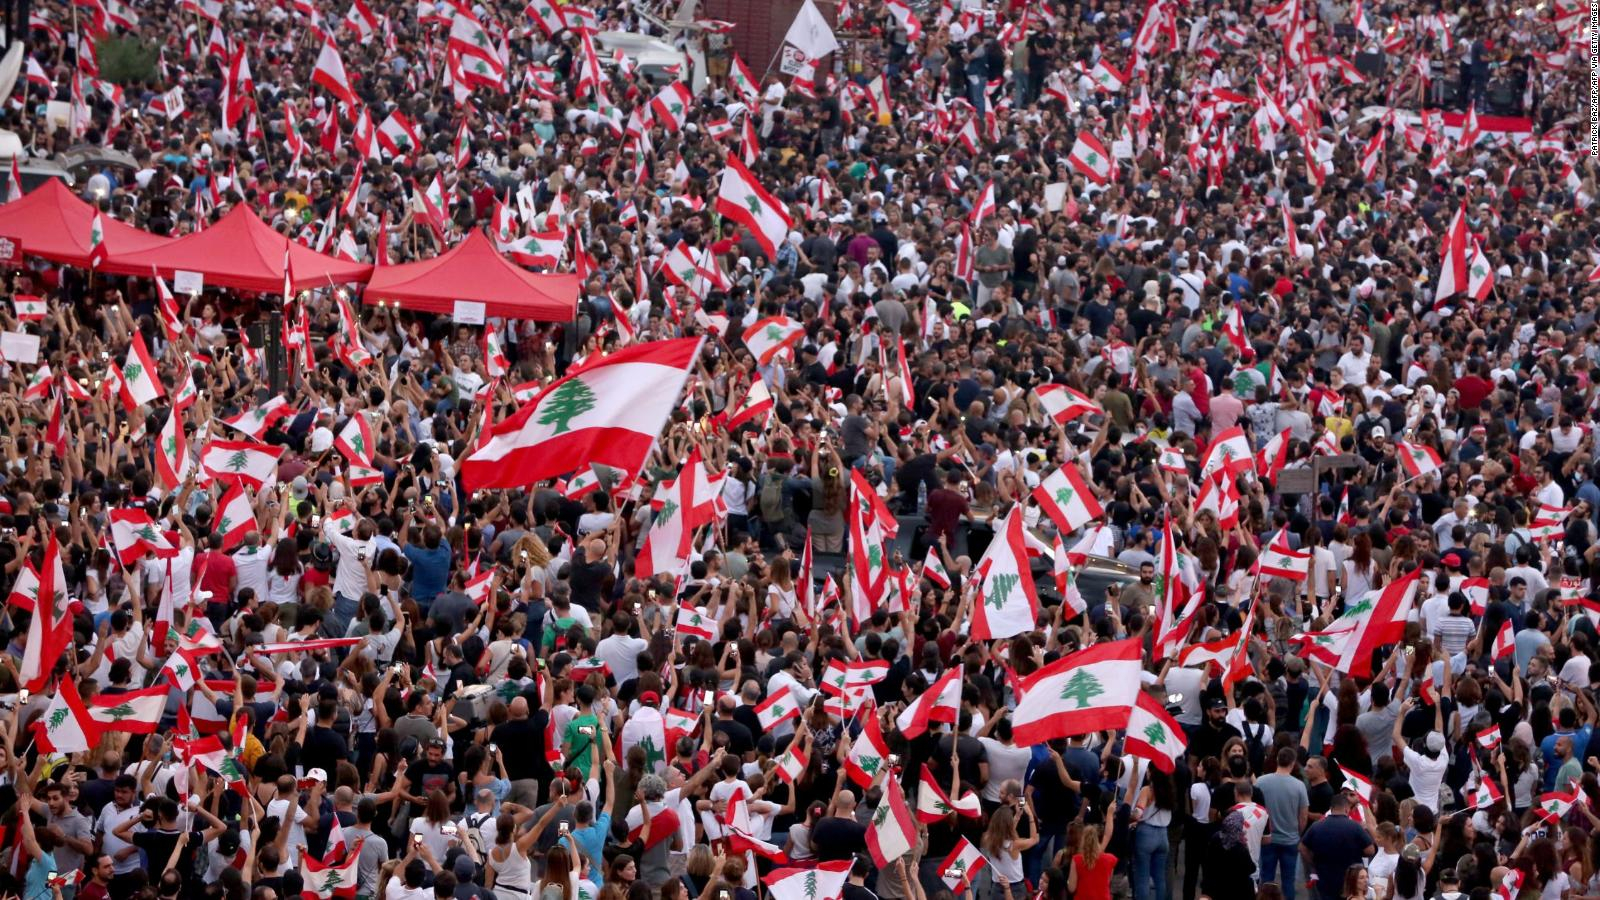 Protestas-Líbano-Whatsapp-llamadas-telefónicas-internet-Beirut-